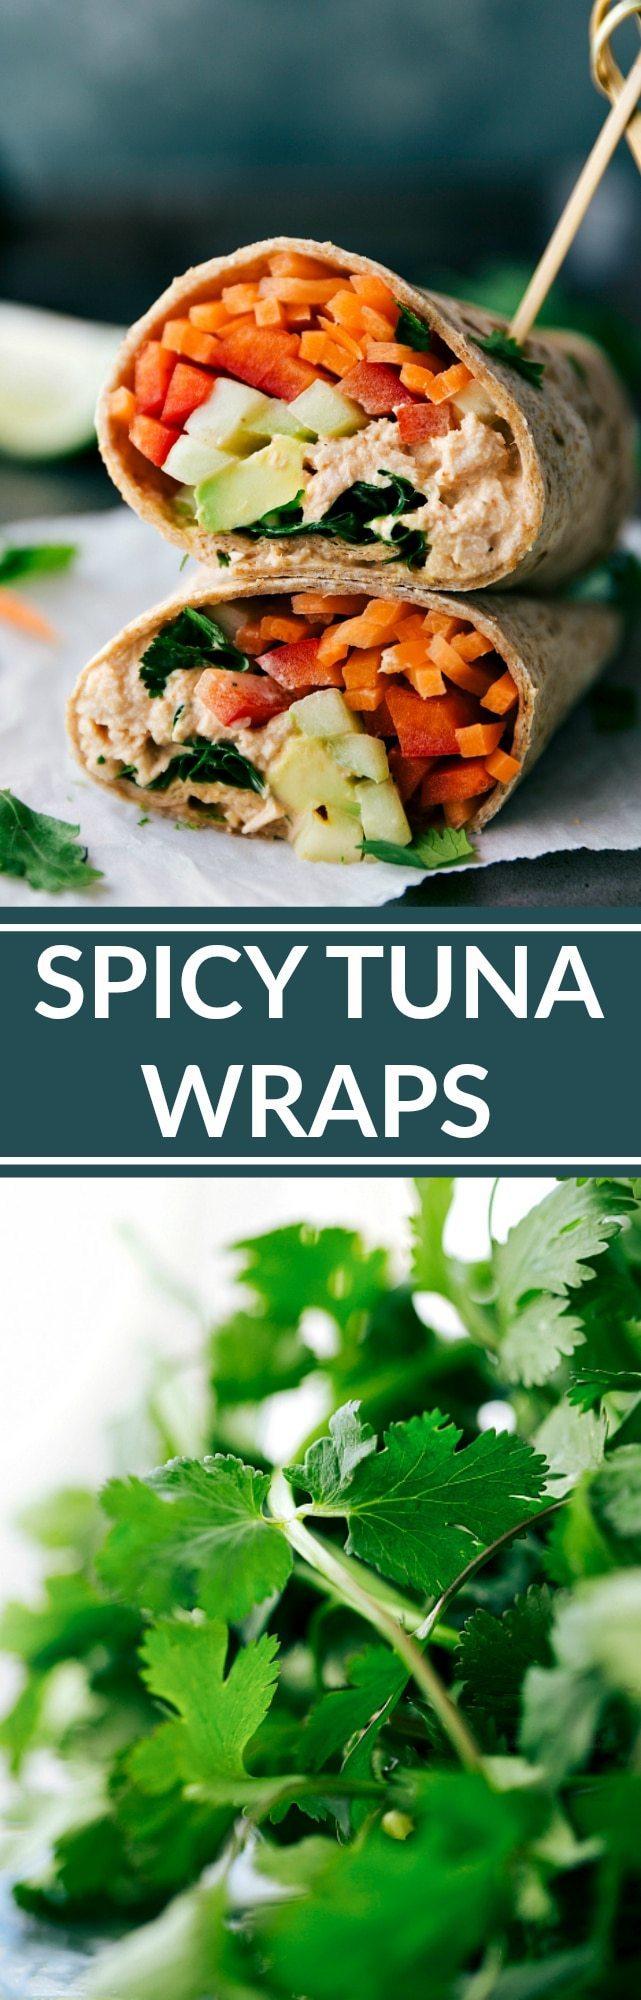 SPICY TUNA WRAPS! Healthy easy and delicious! via chelseasmessyapron.com